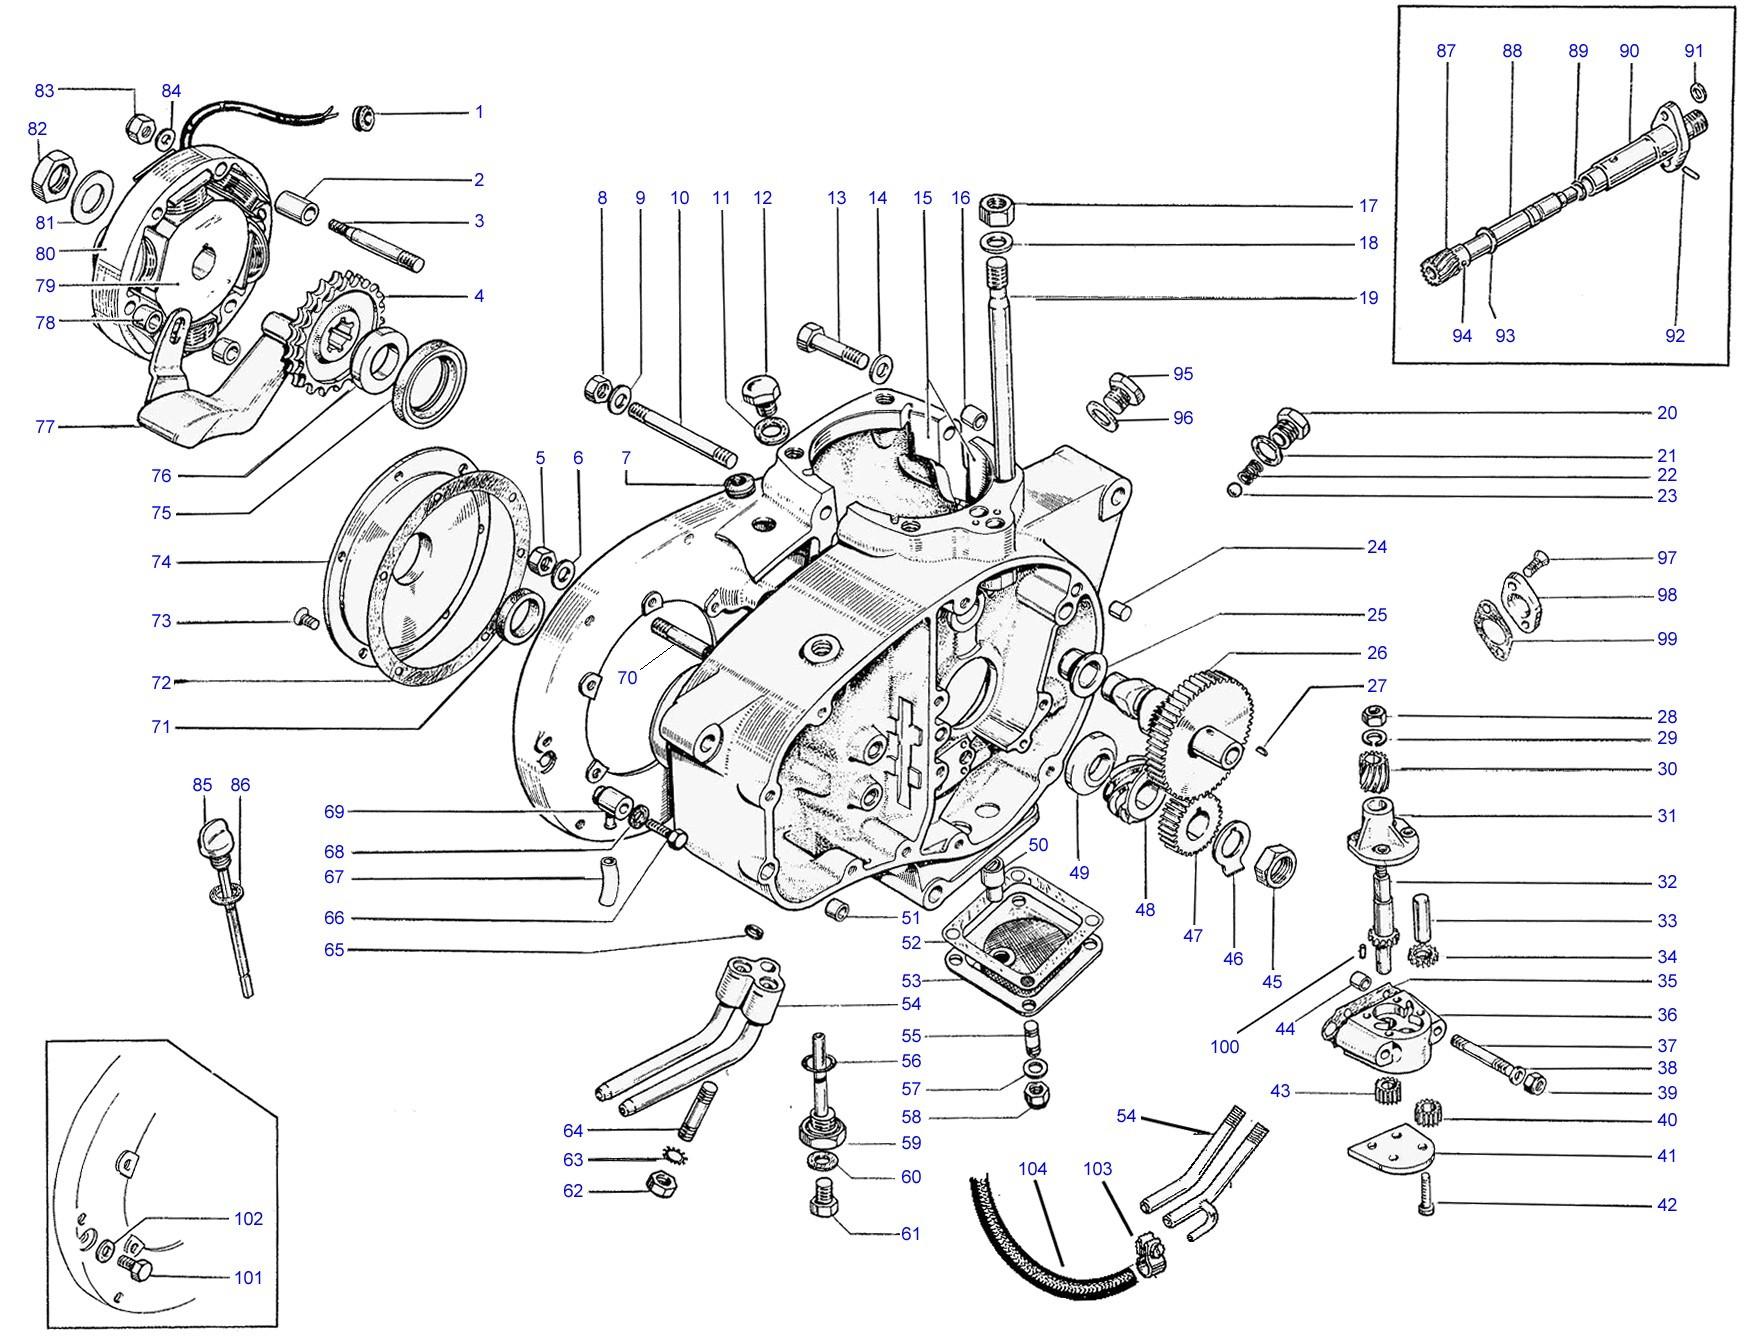 Bsa C15 Wiring Diagram Free Download [diagram In Database] 35mm iPhone Jack Wiring Just Download or Read Jack Wiring